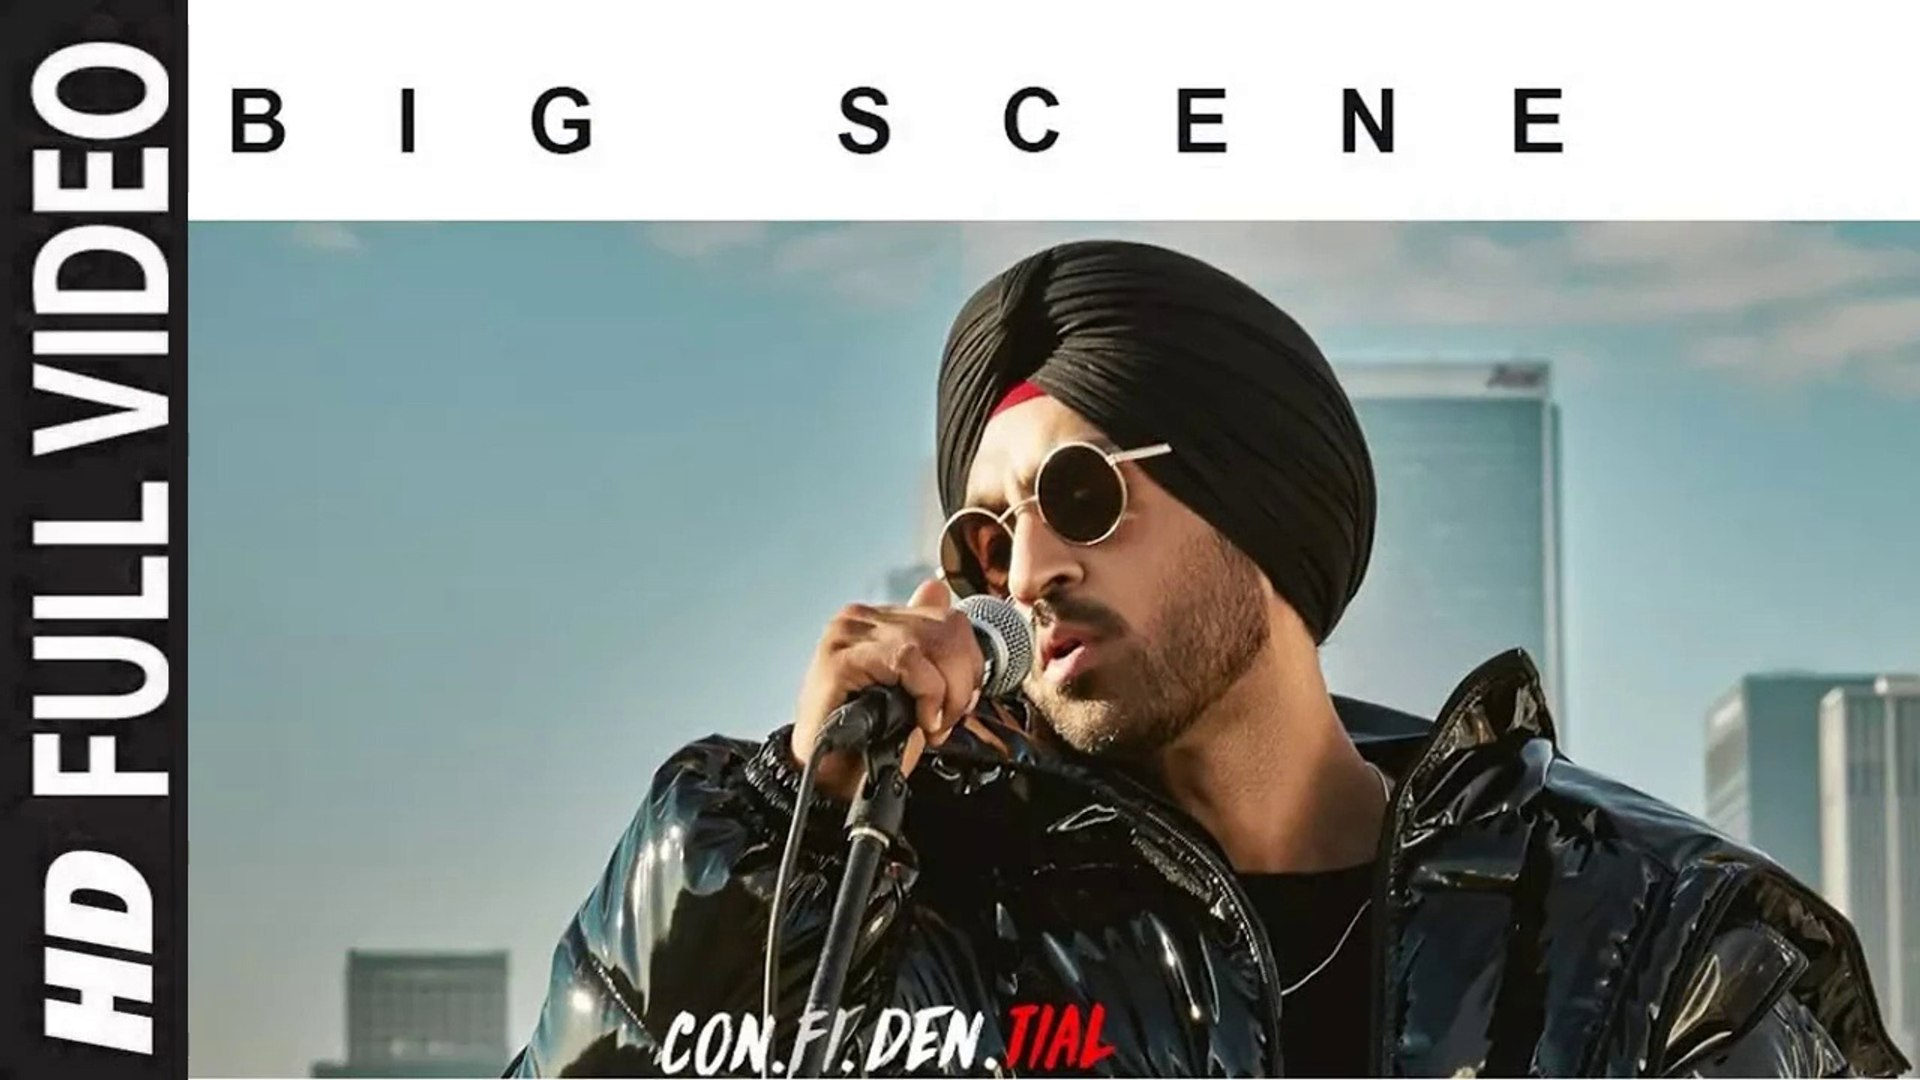 BIG SCENE (Full Video) Diljit Dosanjh   CON FI DEN TIAL   New Punjabi Song  2018 HD